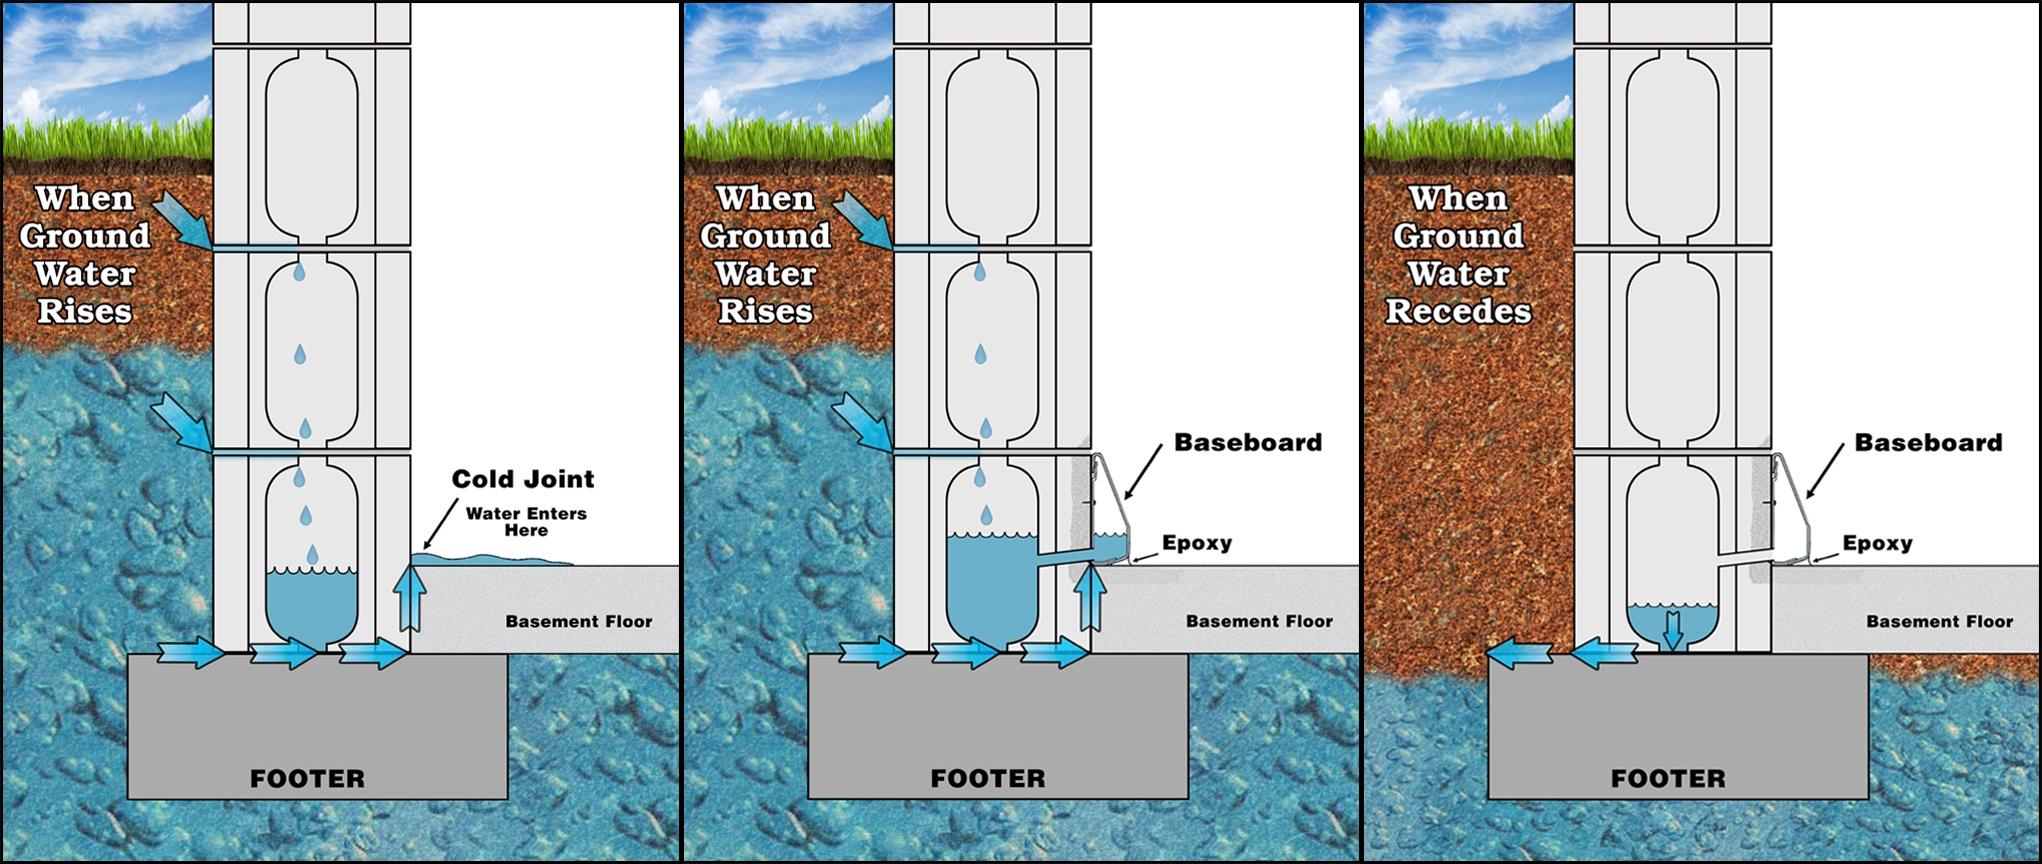 Hydrostatic Pressure Basement Water